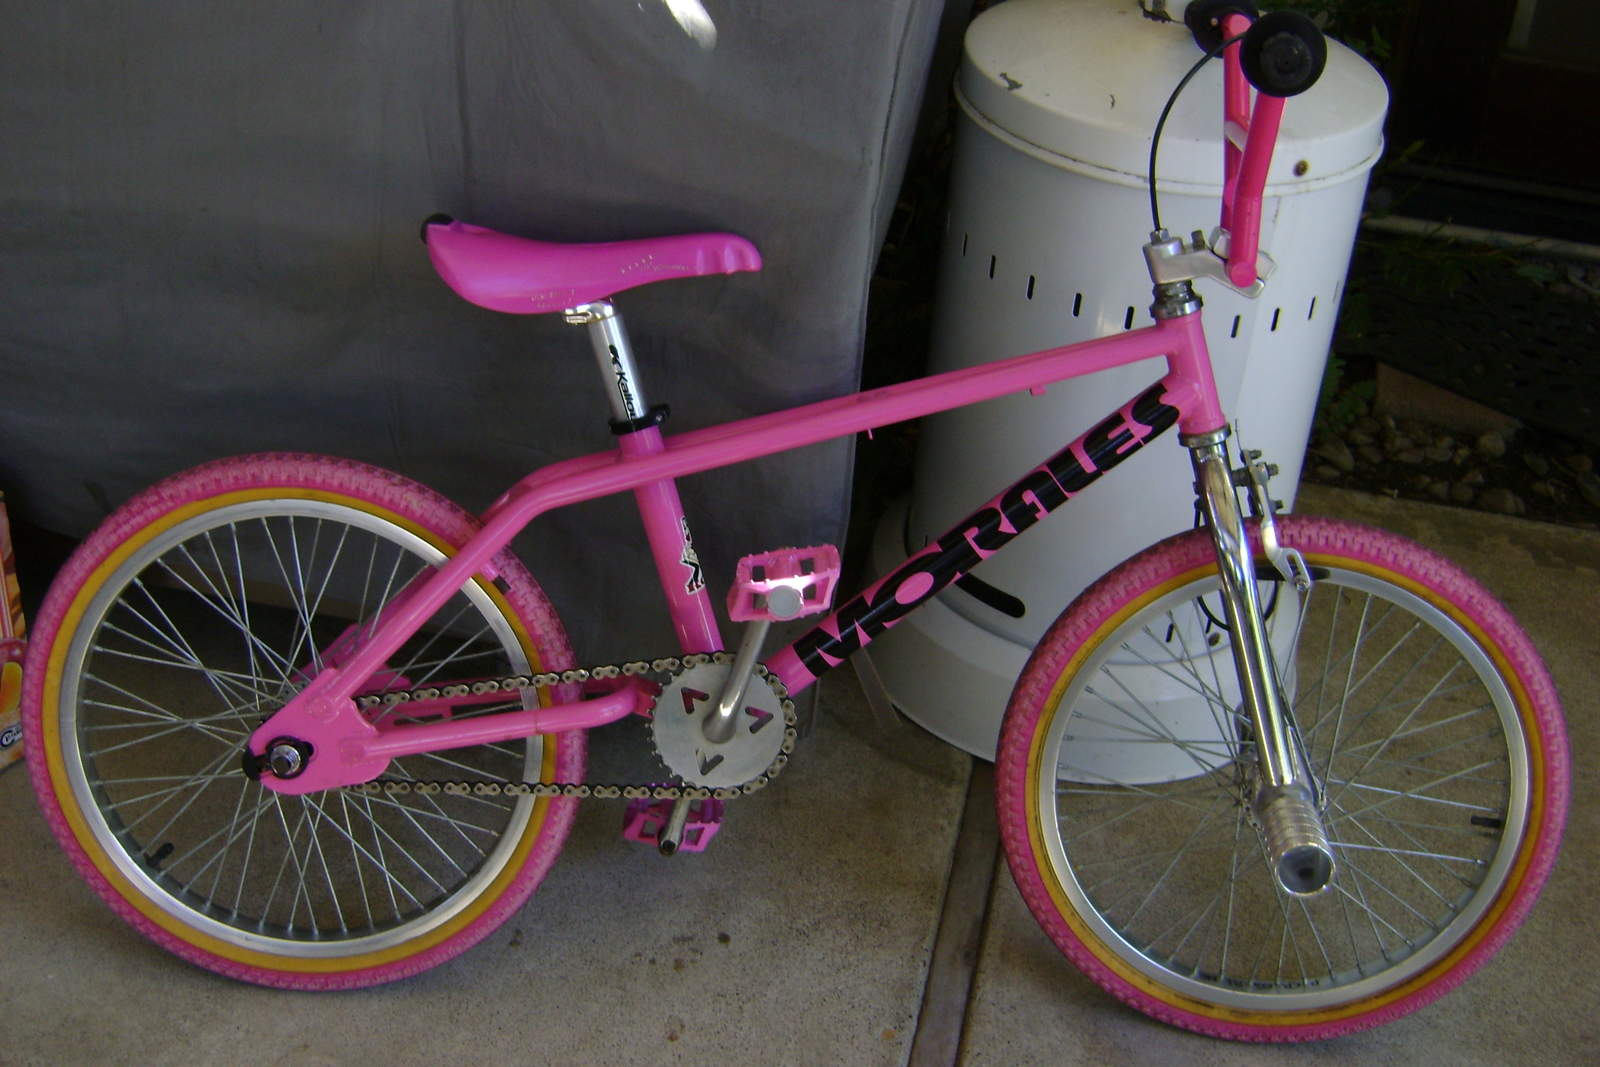 https://s3.amazonaws.com/uploads.bmxmuseum.com/user-images/6905/bikes-freestyle-0575968fa8f8d.jpg